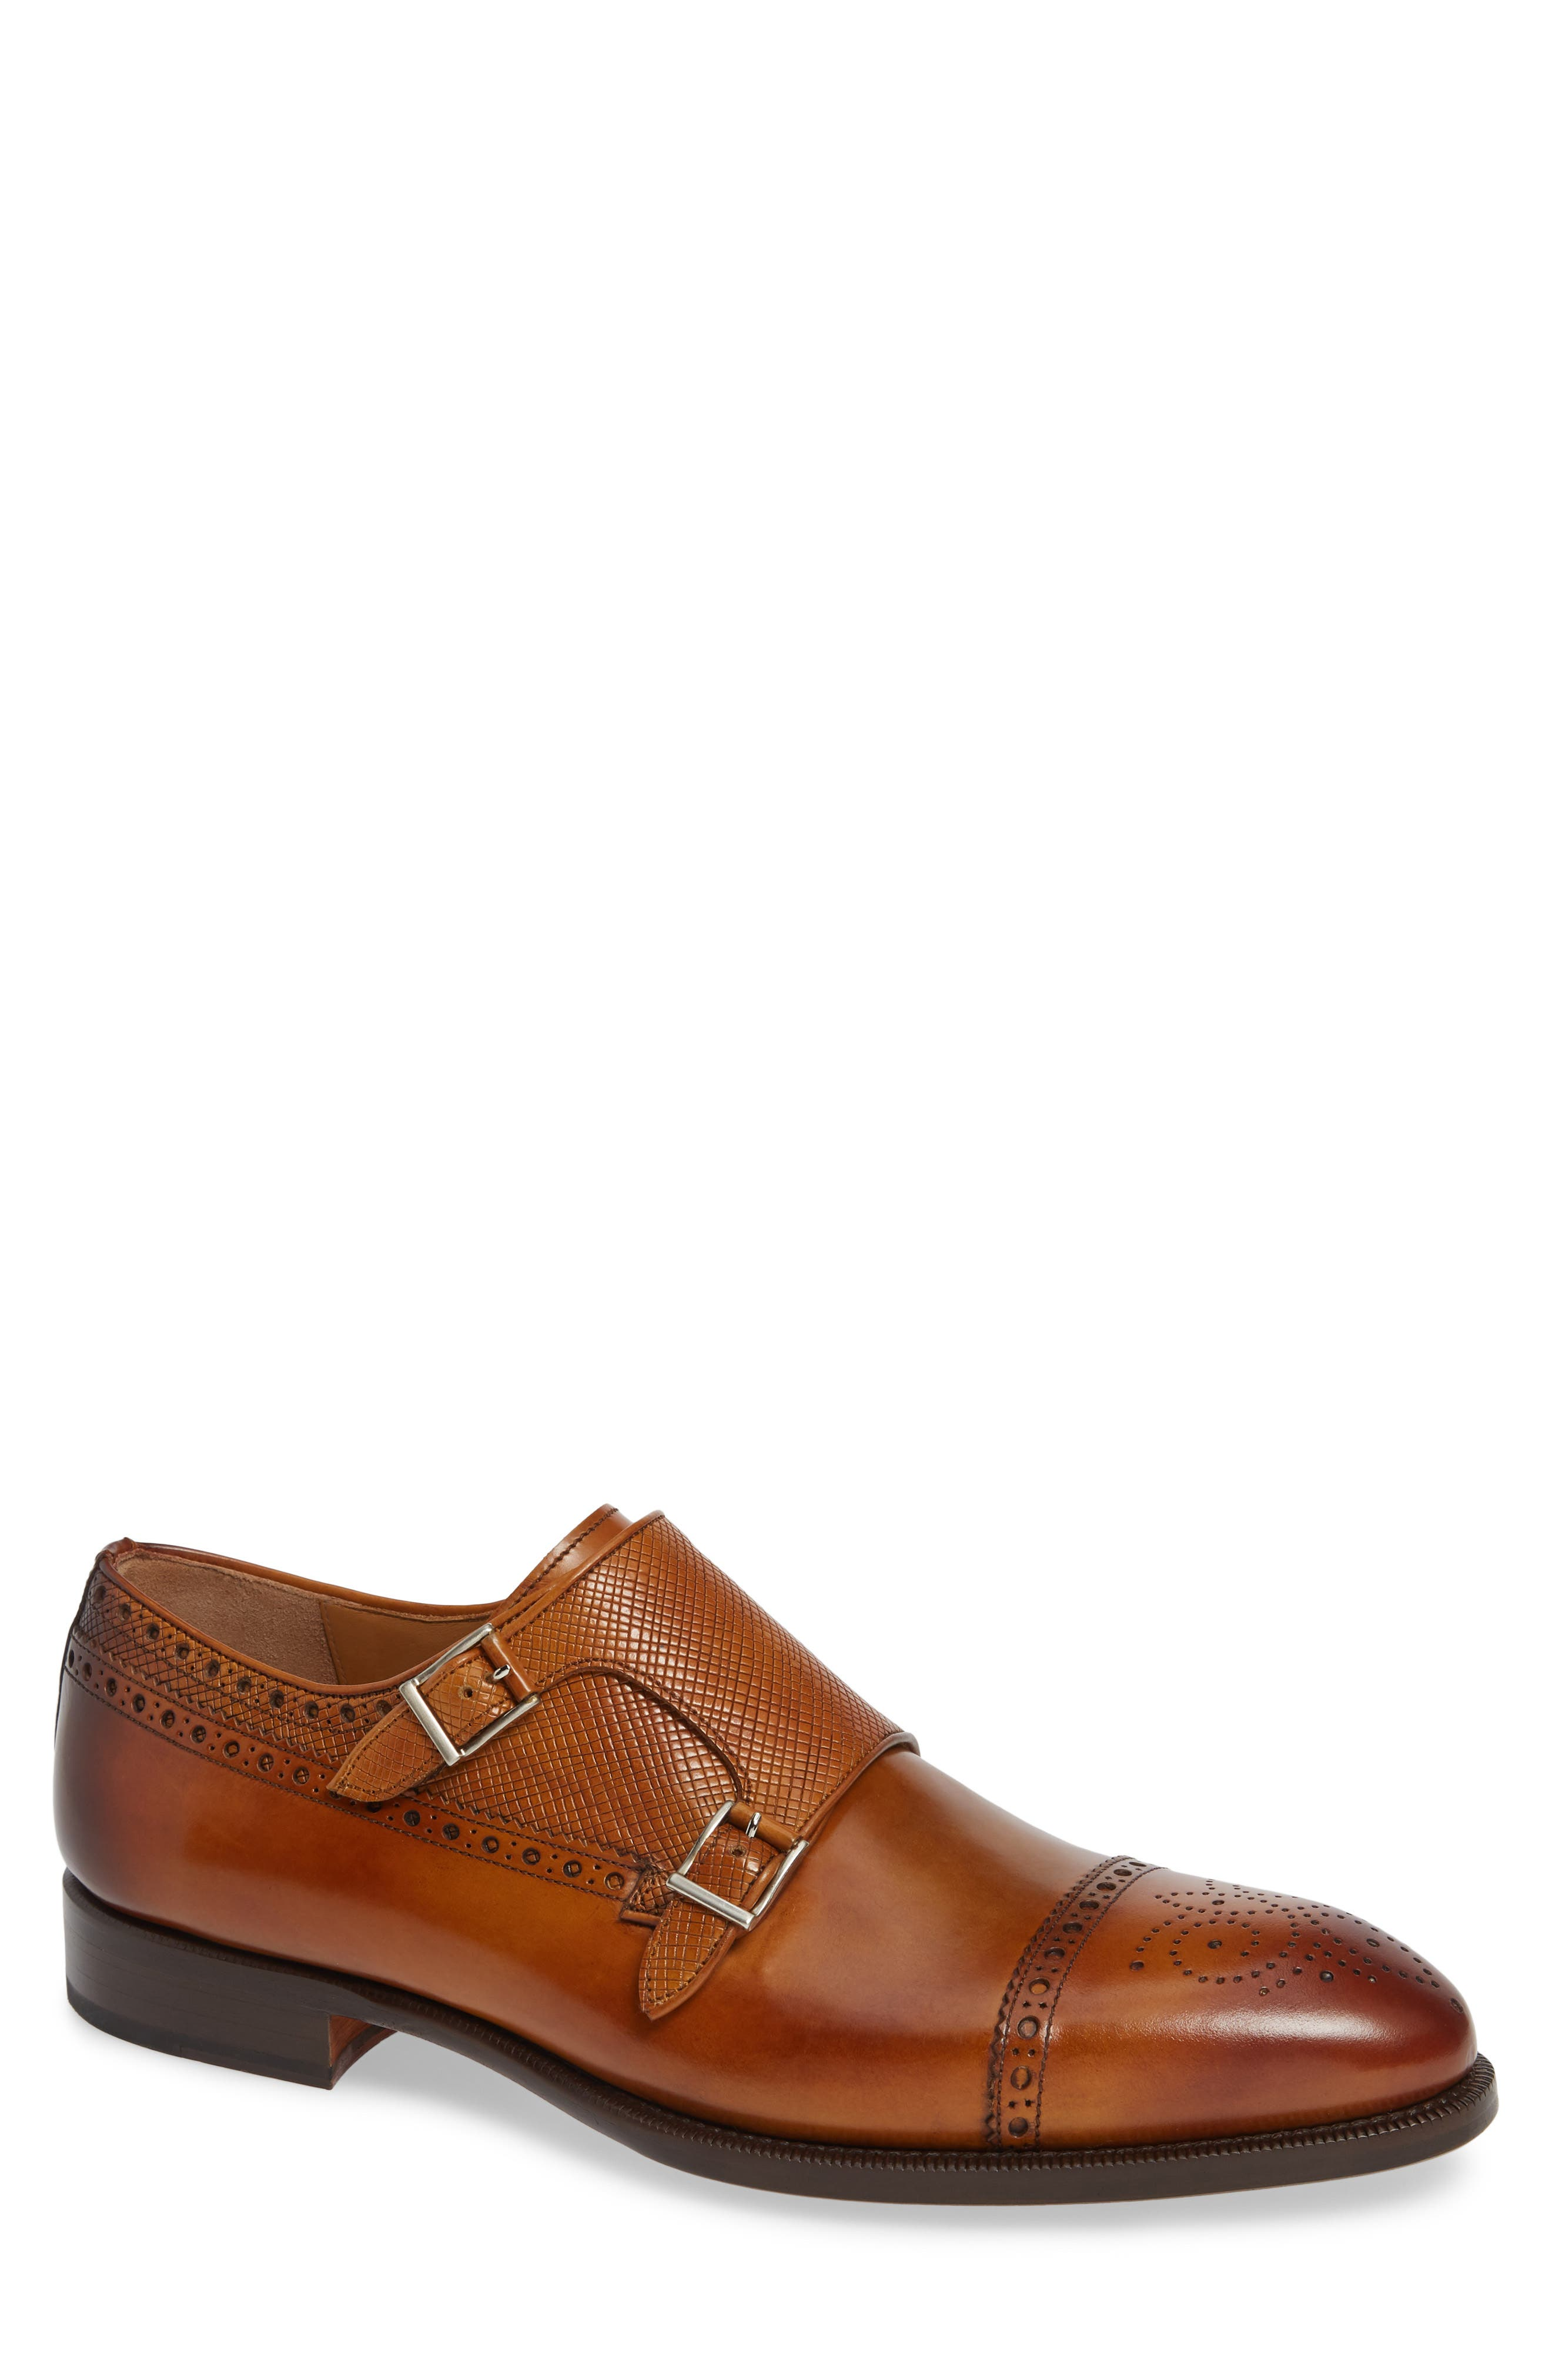 Valda Double Strap Cap Toe Monk Shoe,                             Main thumbnail 1, color,                             BROWN LEATHER